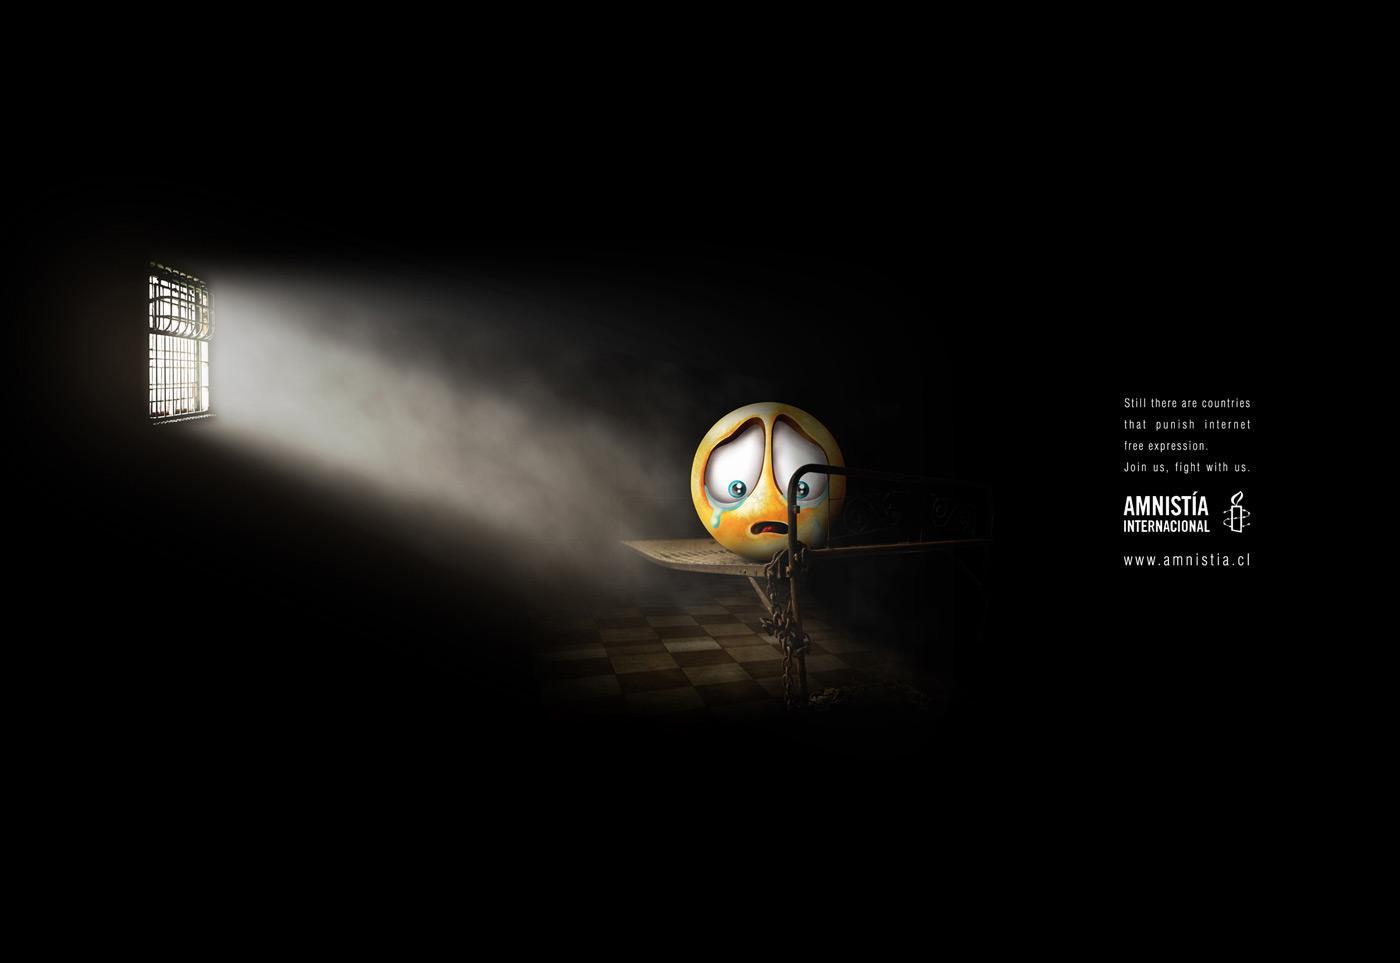 Amnesty International Print Ad -  Internet, 2